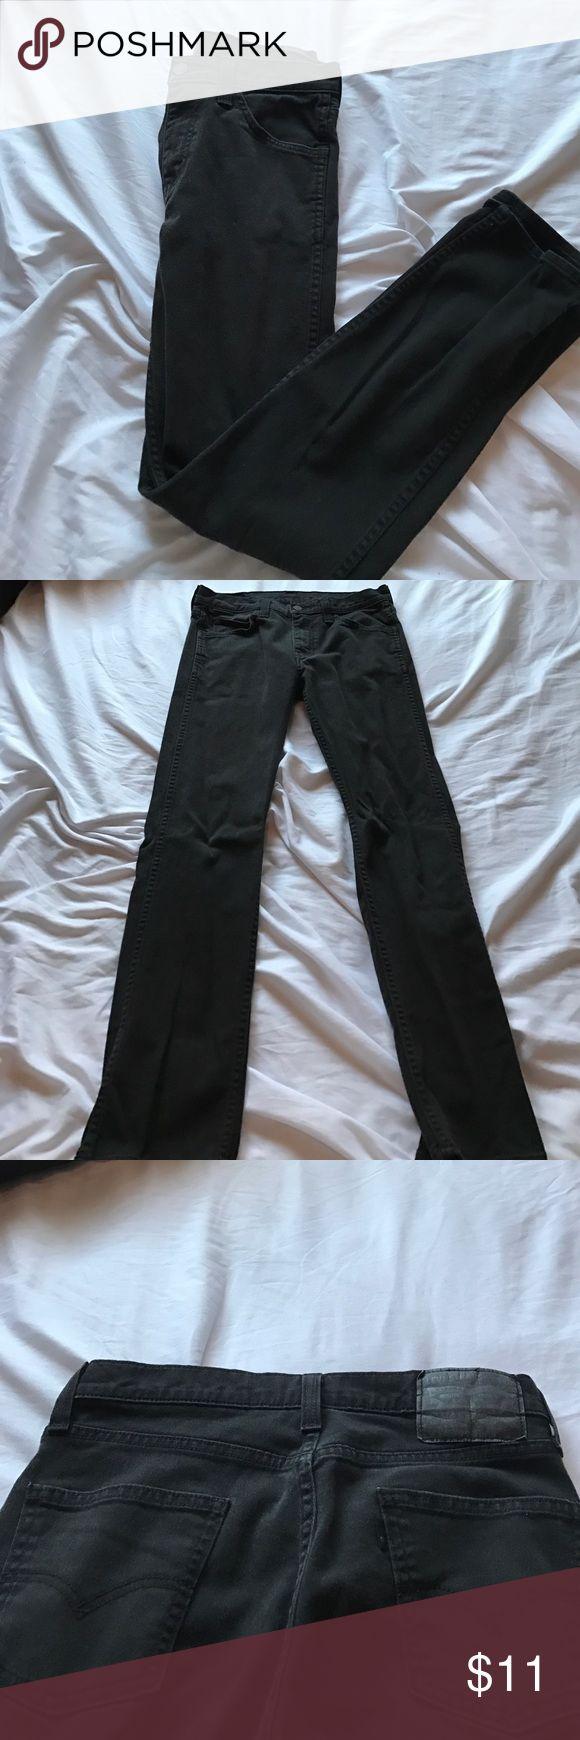 Black Levi's pants Slim straight: length 32 Levi's Jeans Slim Straight